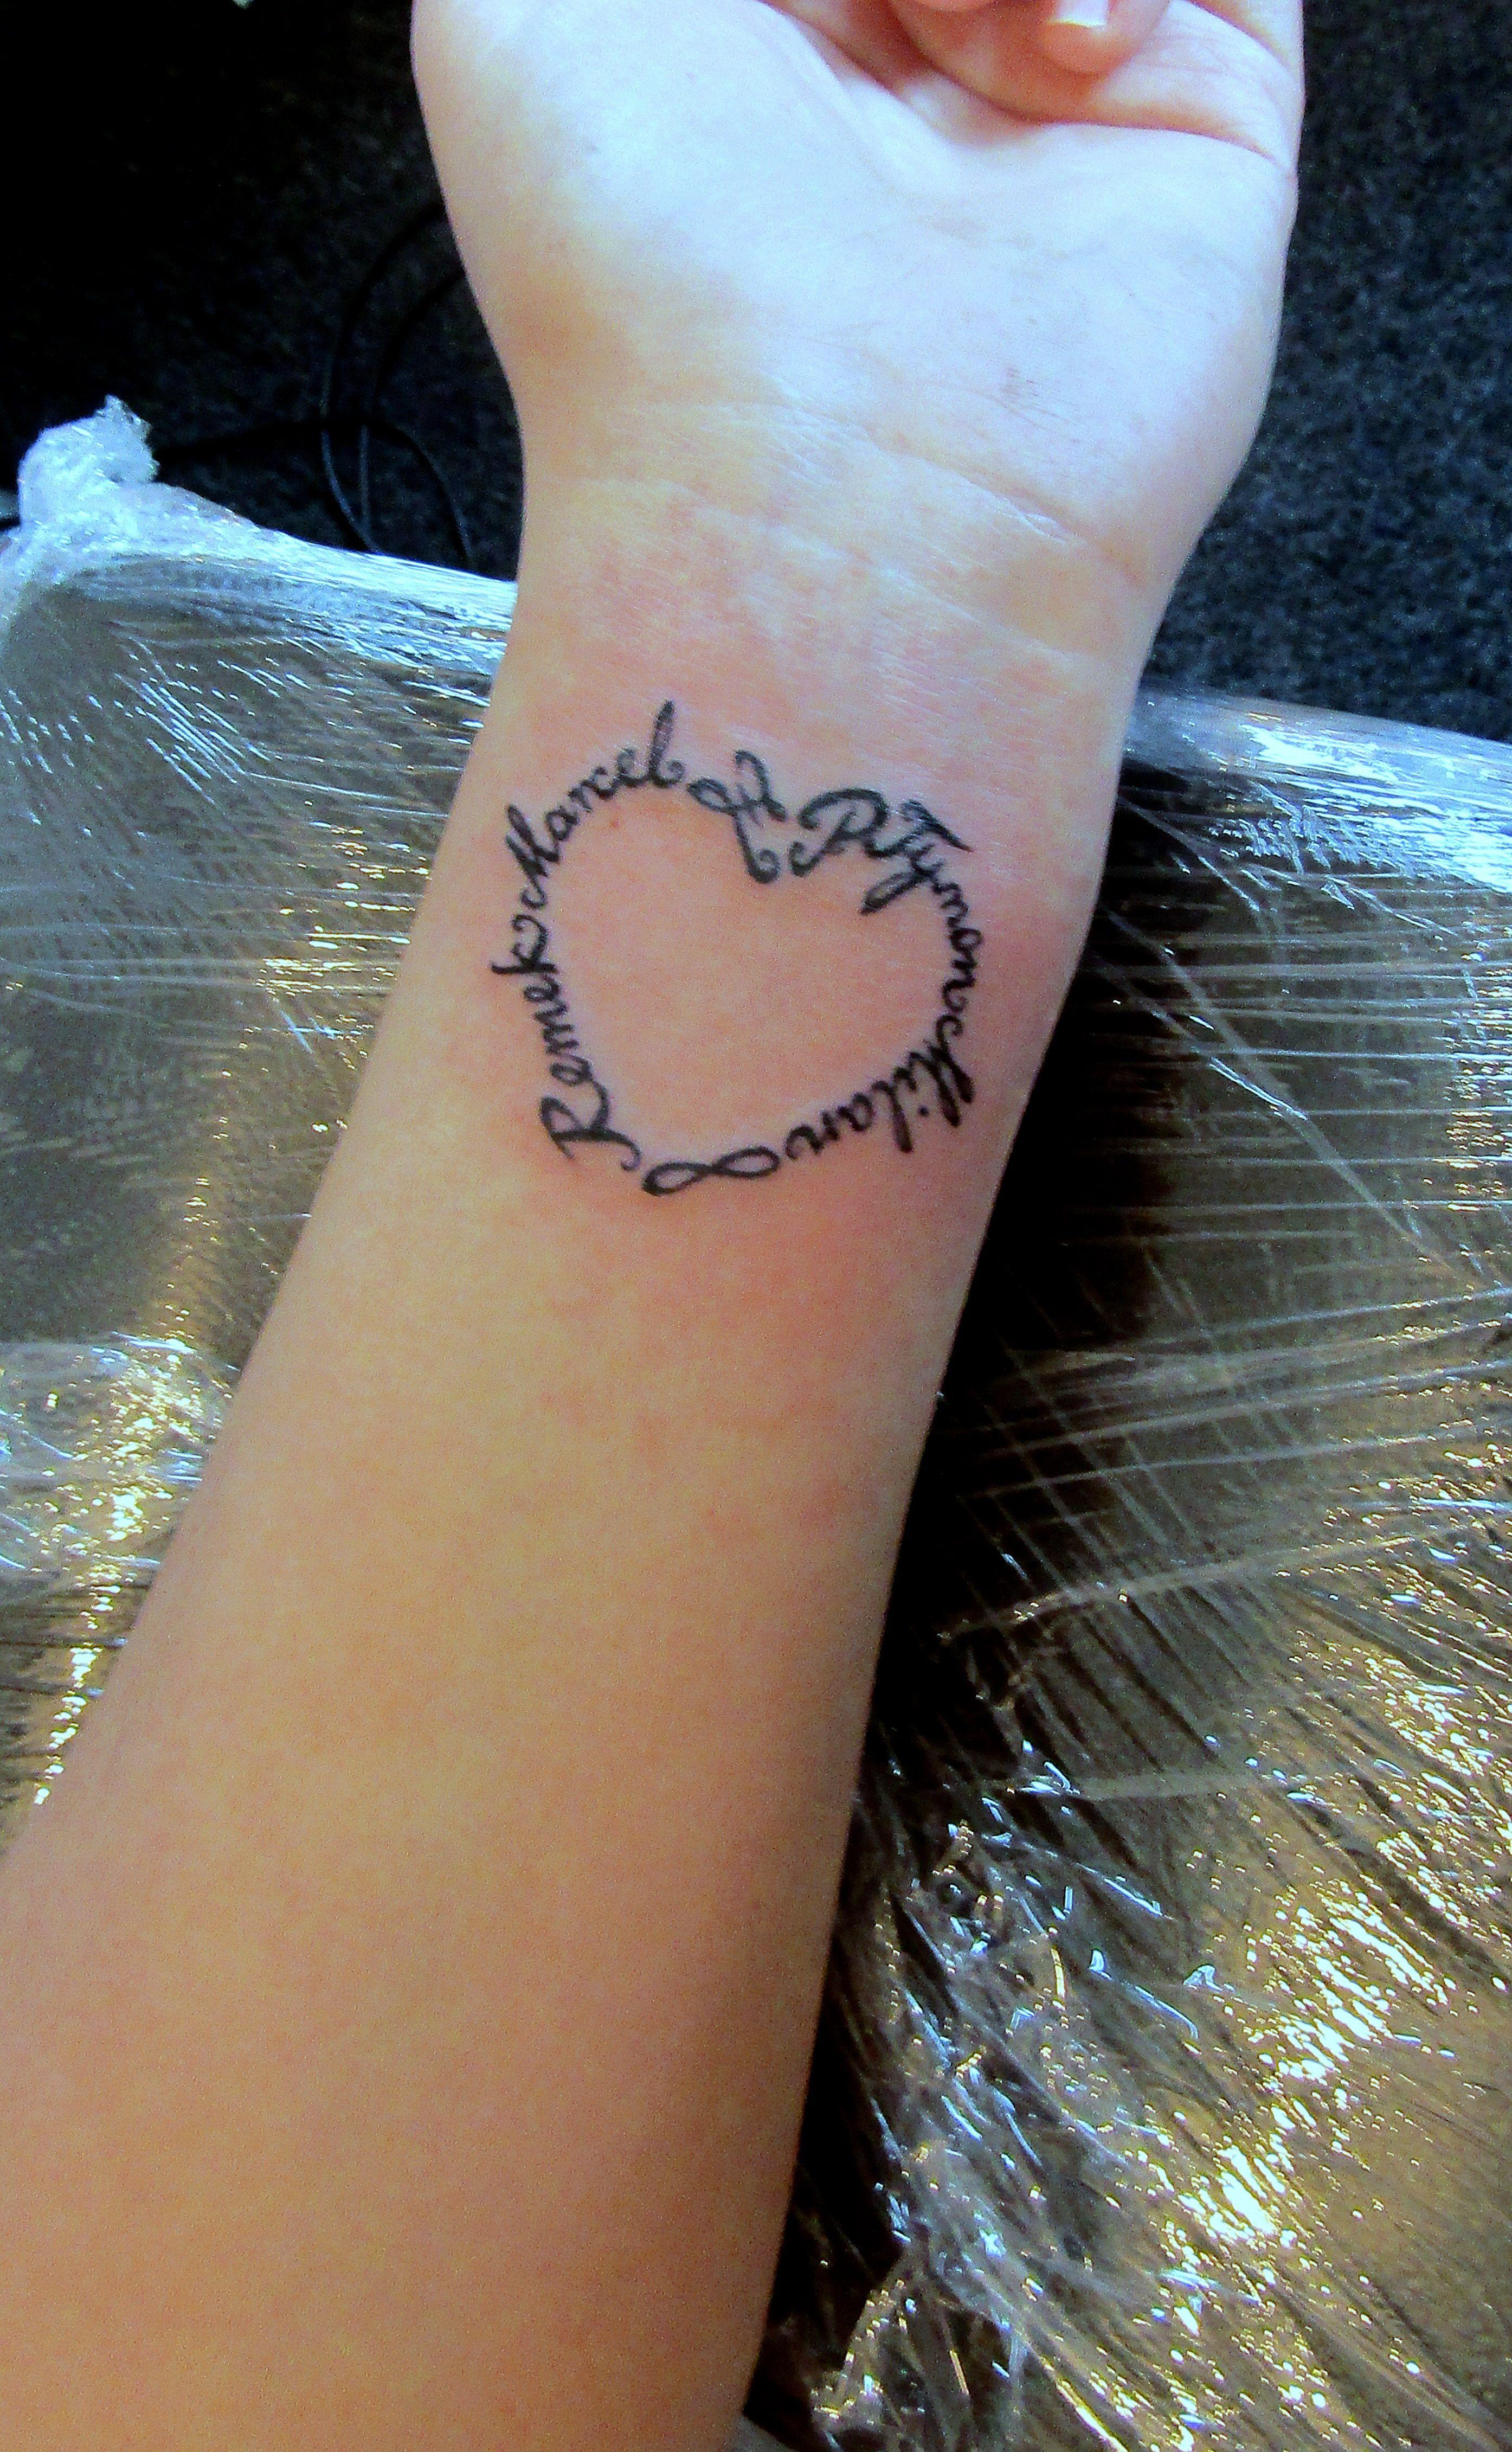 Childrens Names Tattoos For Women: Children Names Tattoo